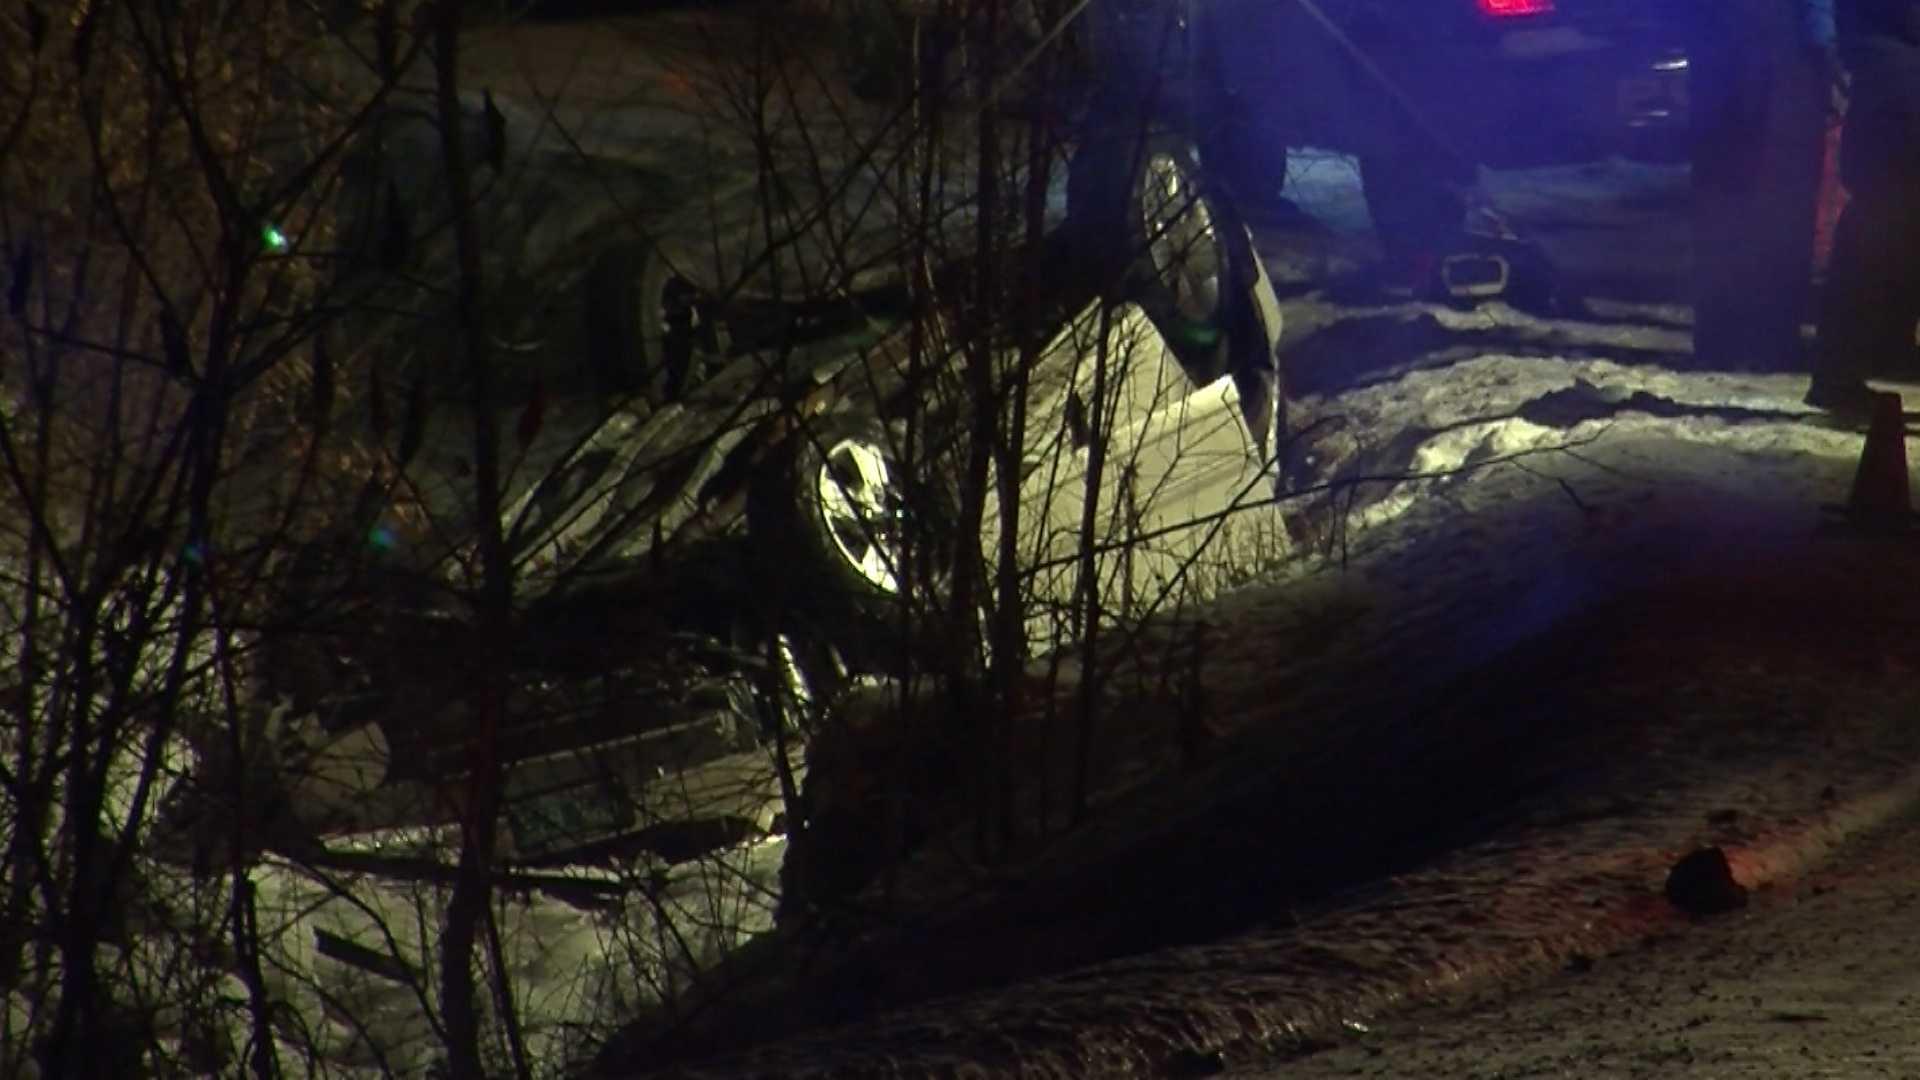 1-23-14 Car rolls into creek, 1 taken to hospital - img